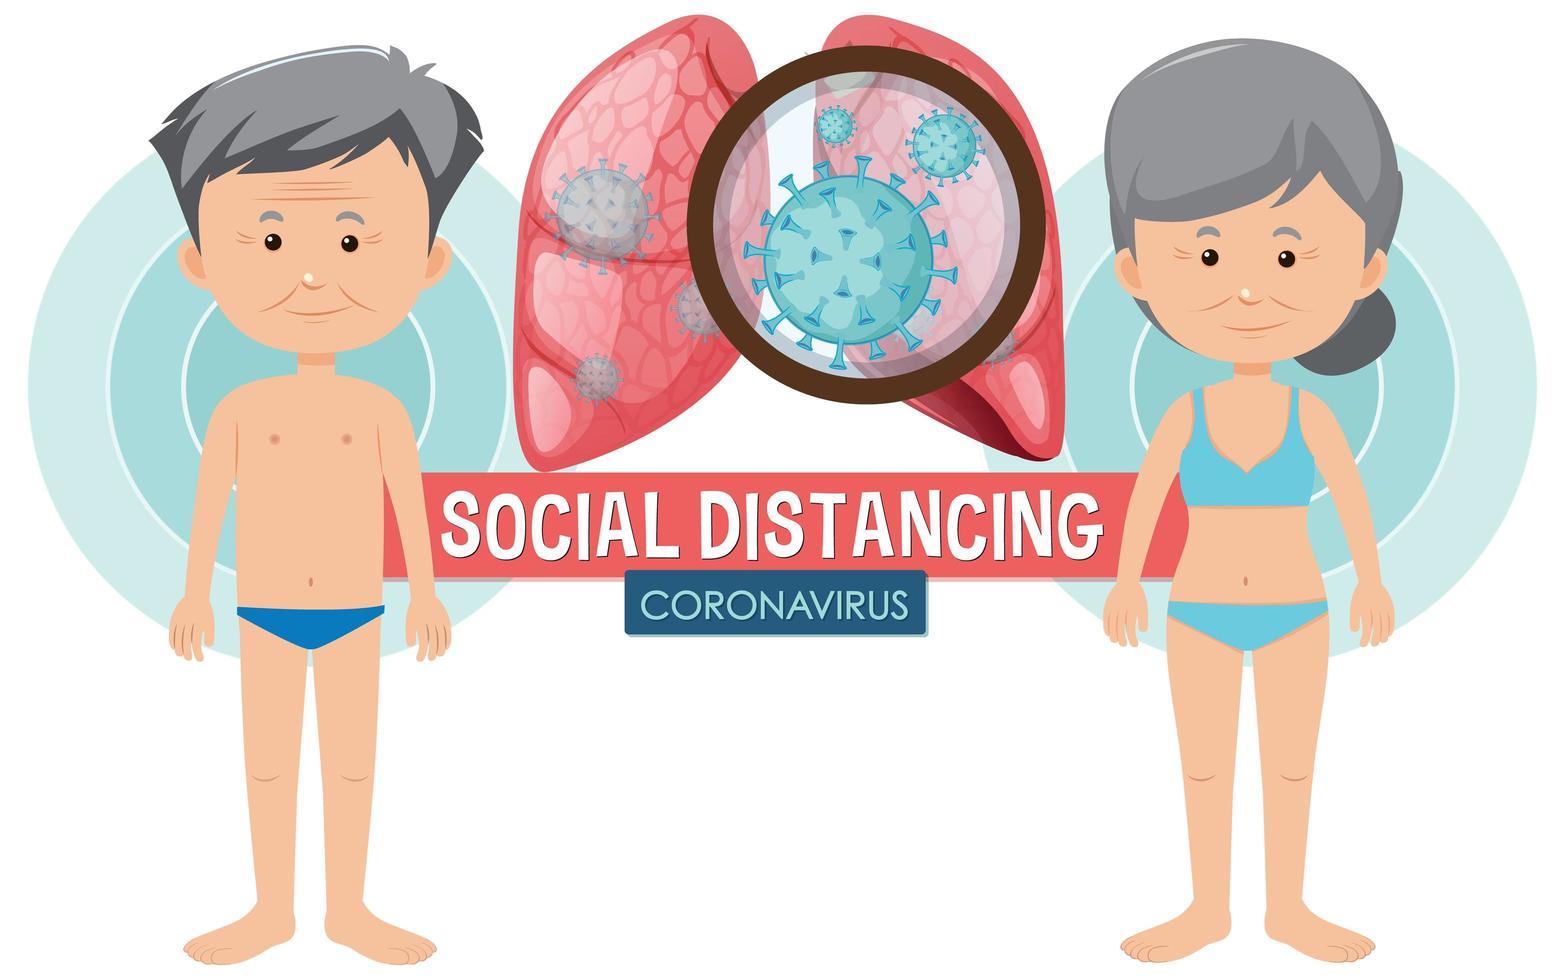 Coronavirus elderly people affected and social distancing vector